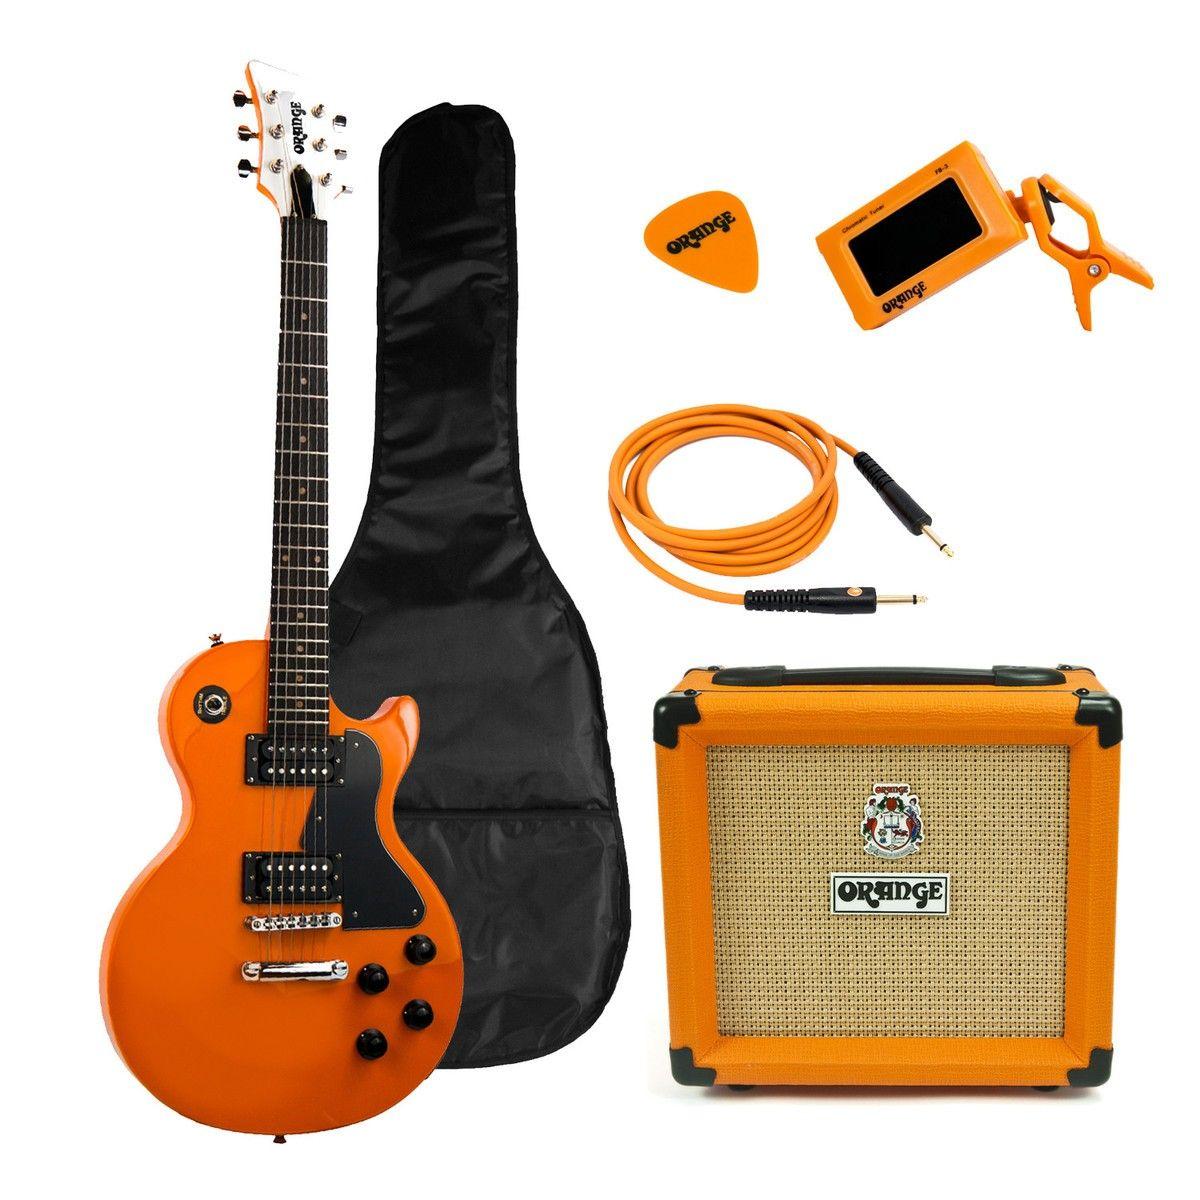 orange crush pix cr12l guitar and amp starter pack orange guitar room guitar guitar amp. Black Bedroom Furniture Sets. Home Design Ideas